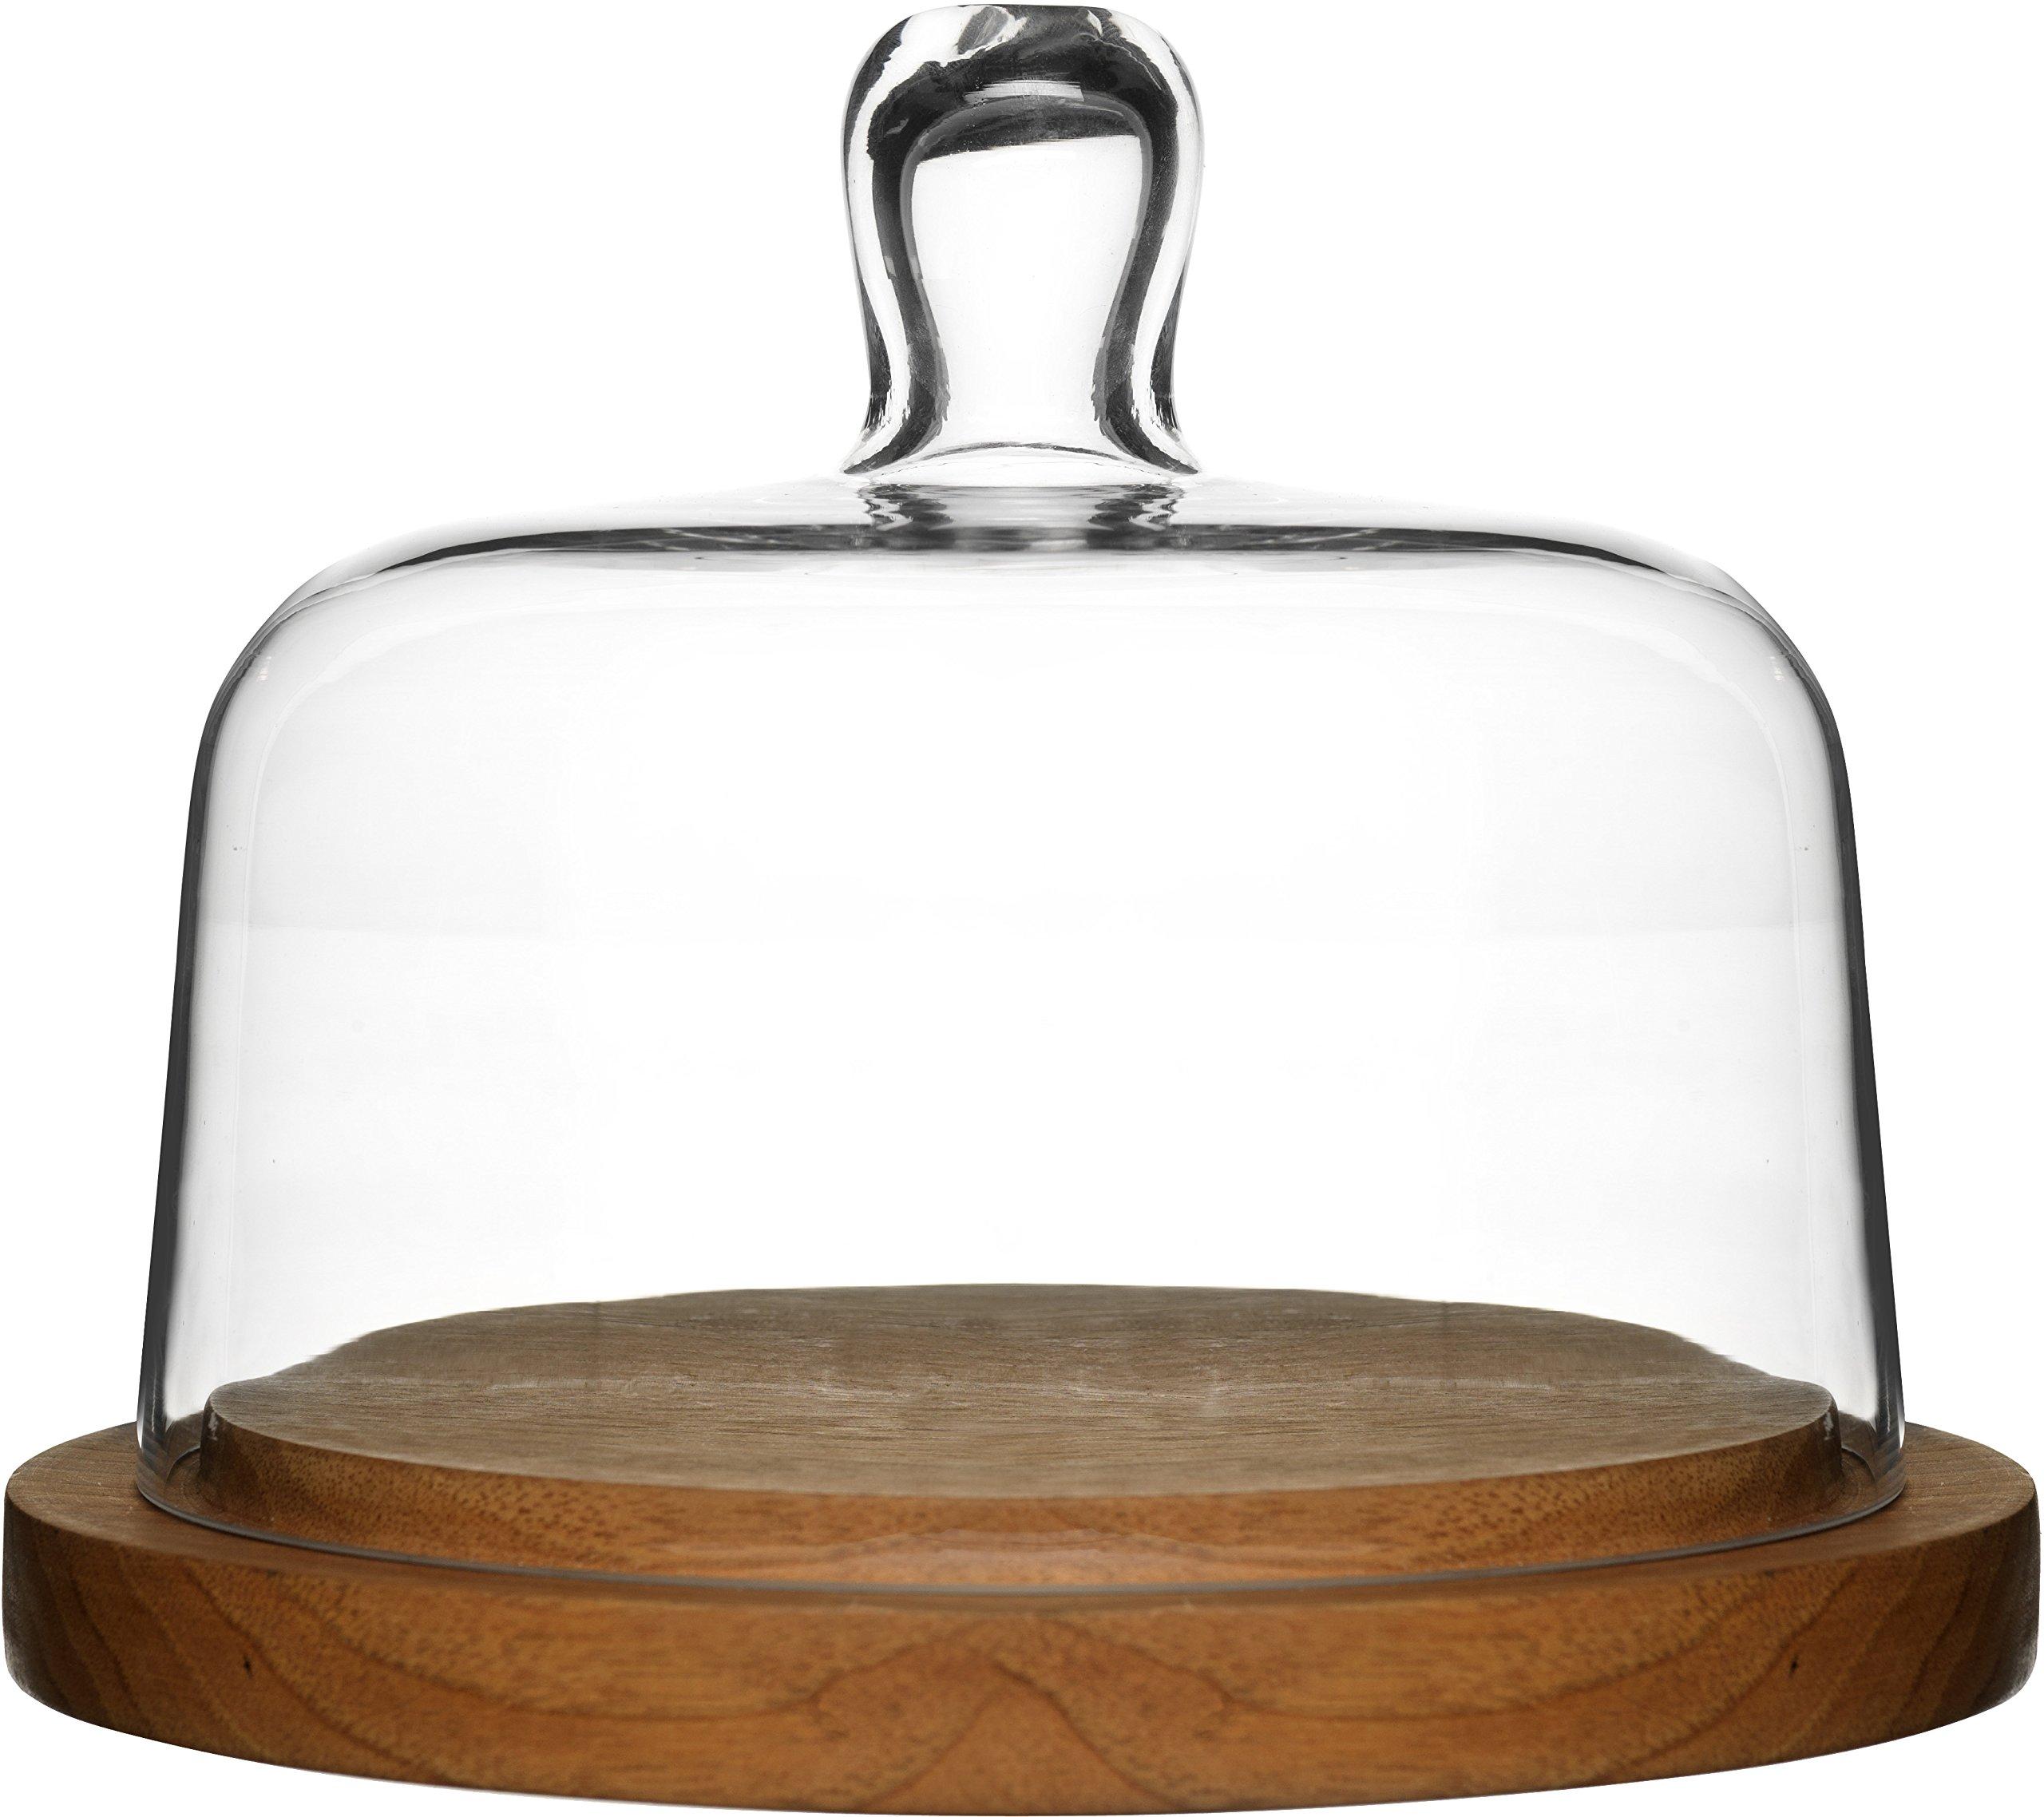 Sagaform 5026044 Oak Cheese Dome with Hand-Blown Glass Lid by Sagaform